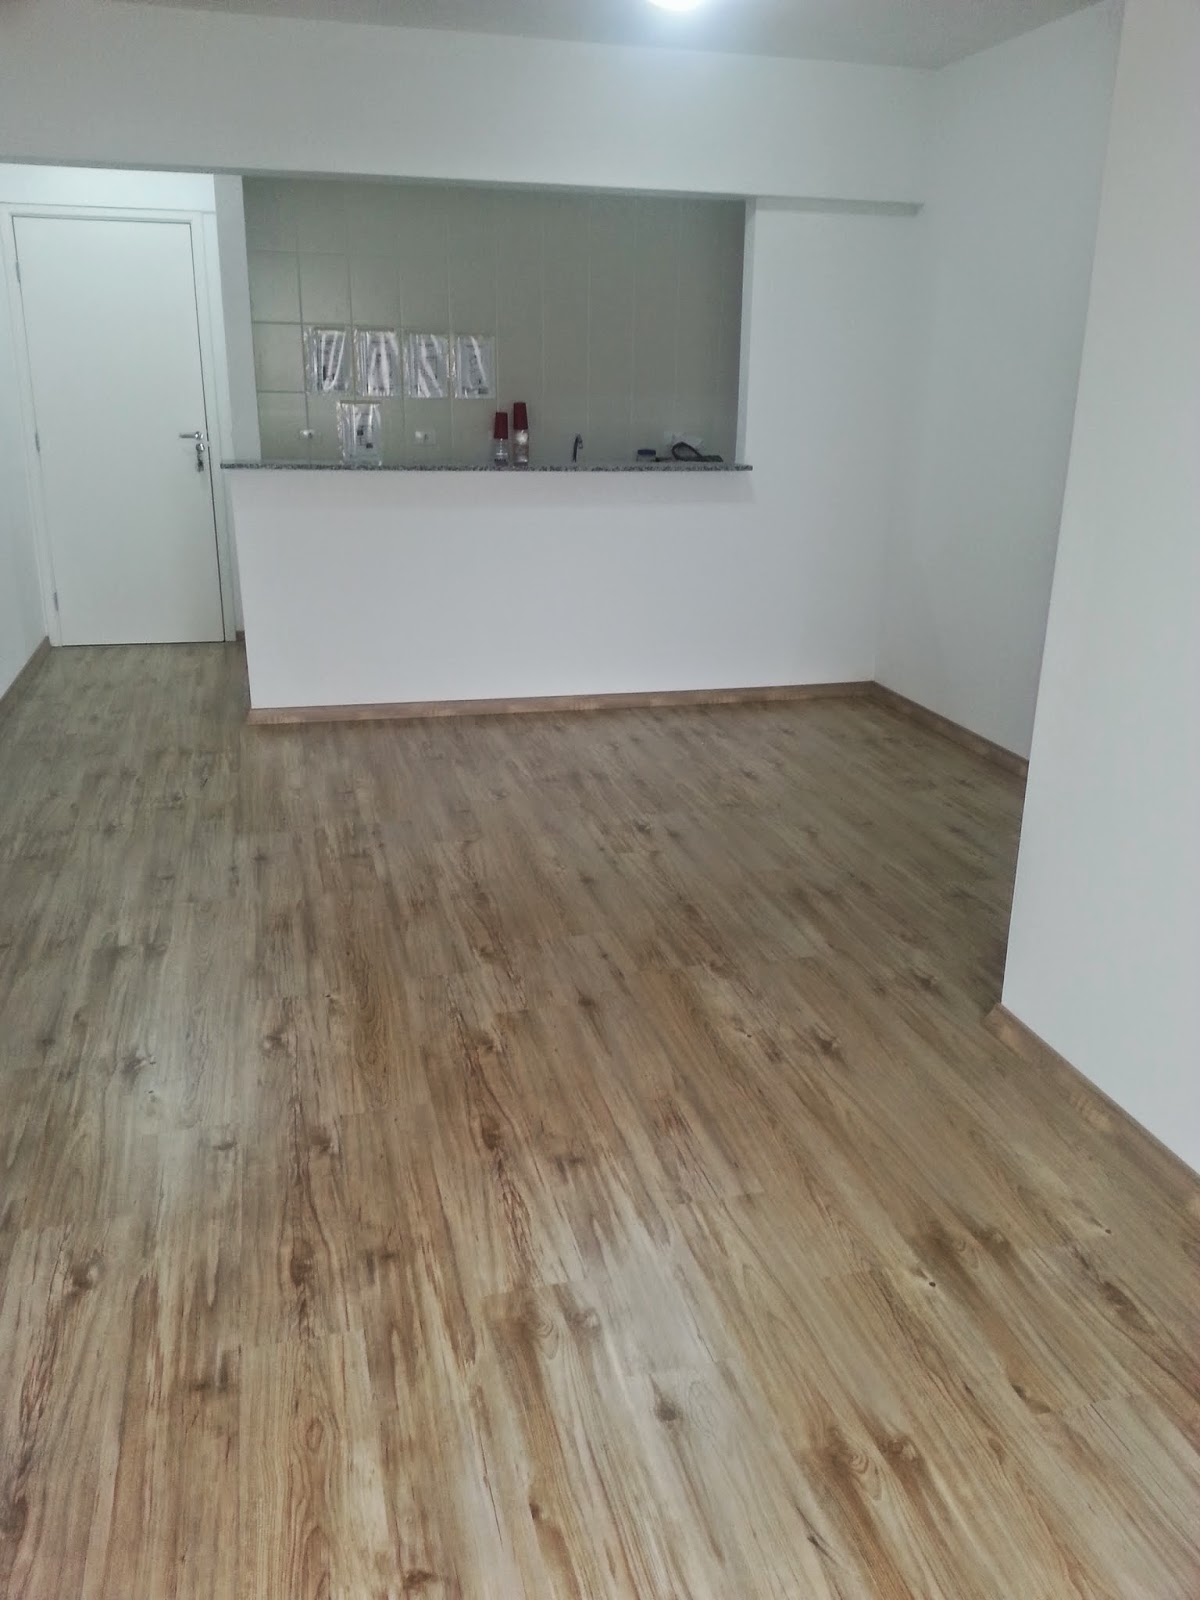 Casa da fl piso laminado ou porcelanato e o escolhido - Colocar piso vinilico ...